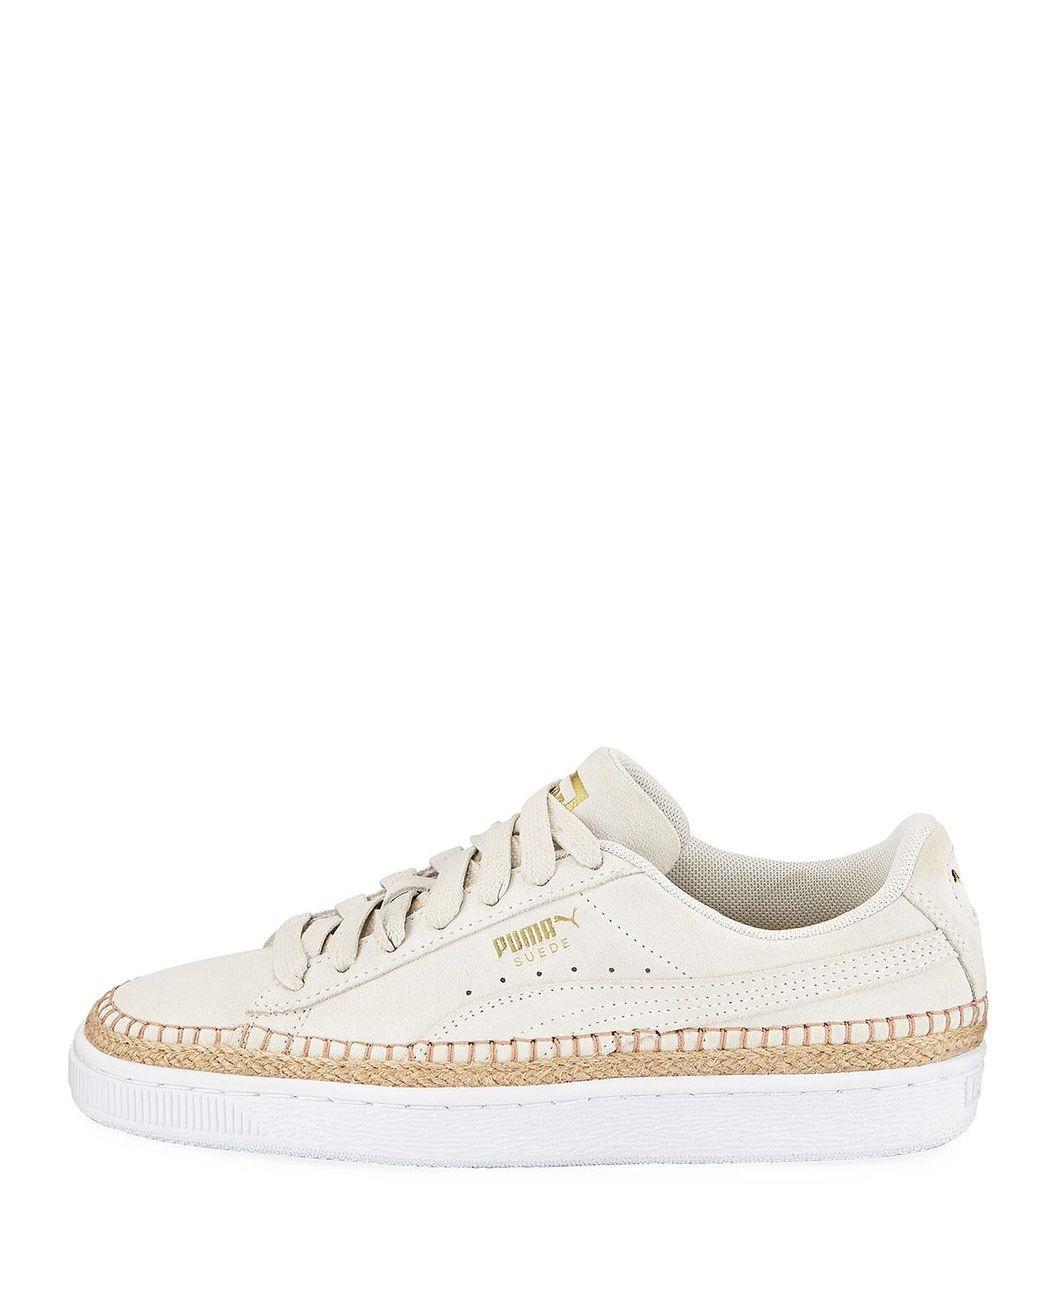 PUMA Sneakerdrille Low top Suede Espadrille Sneakers in